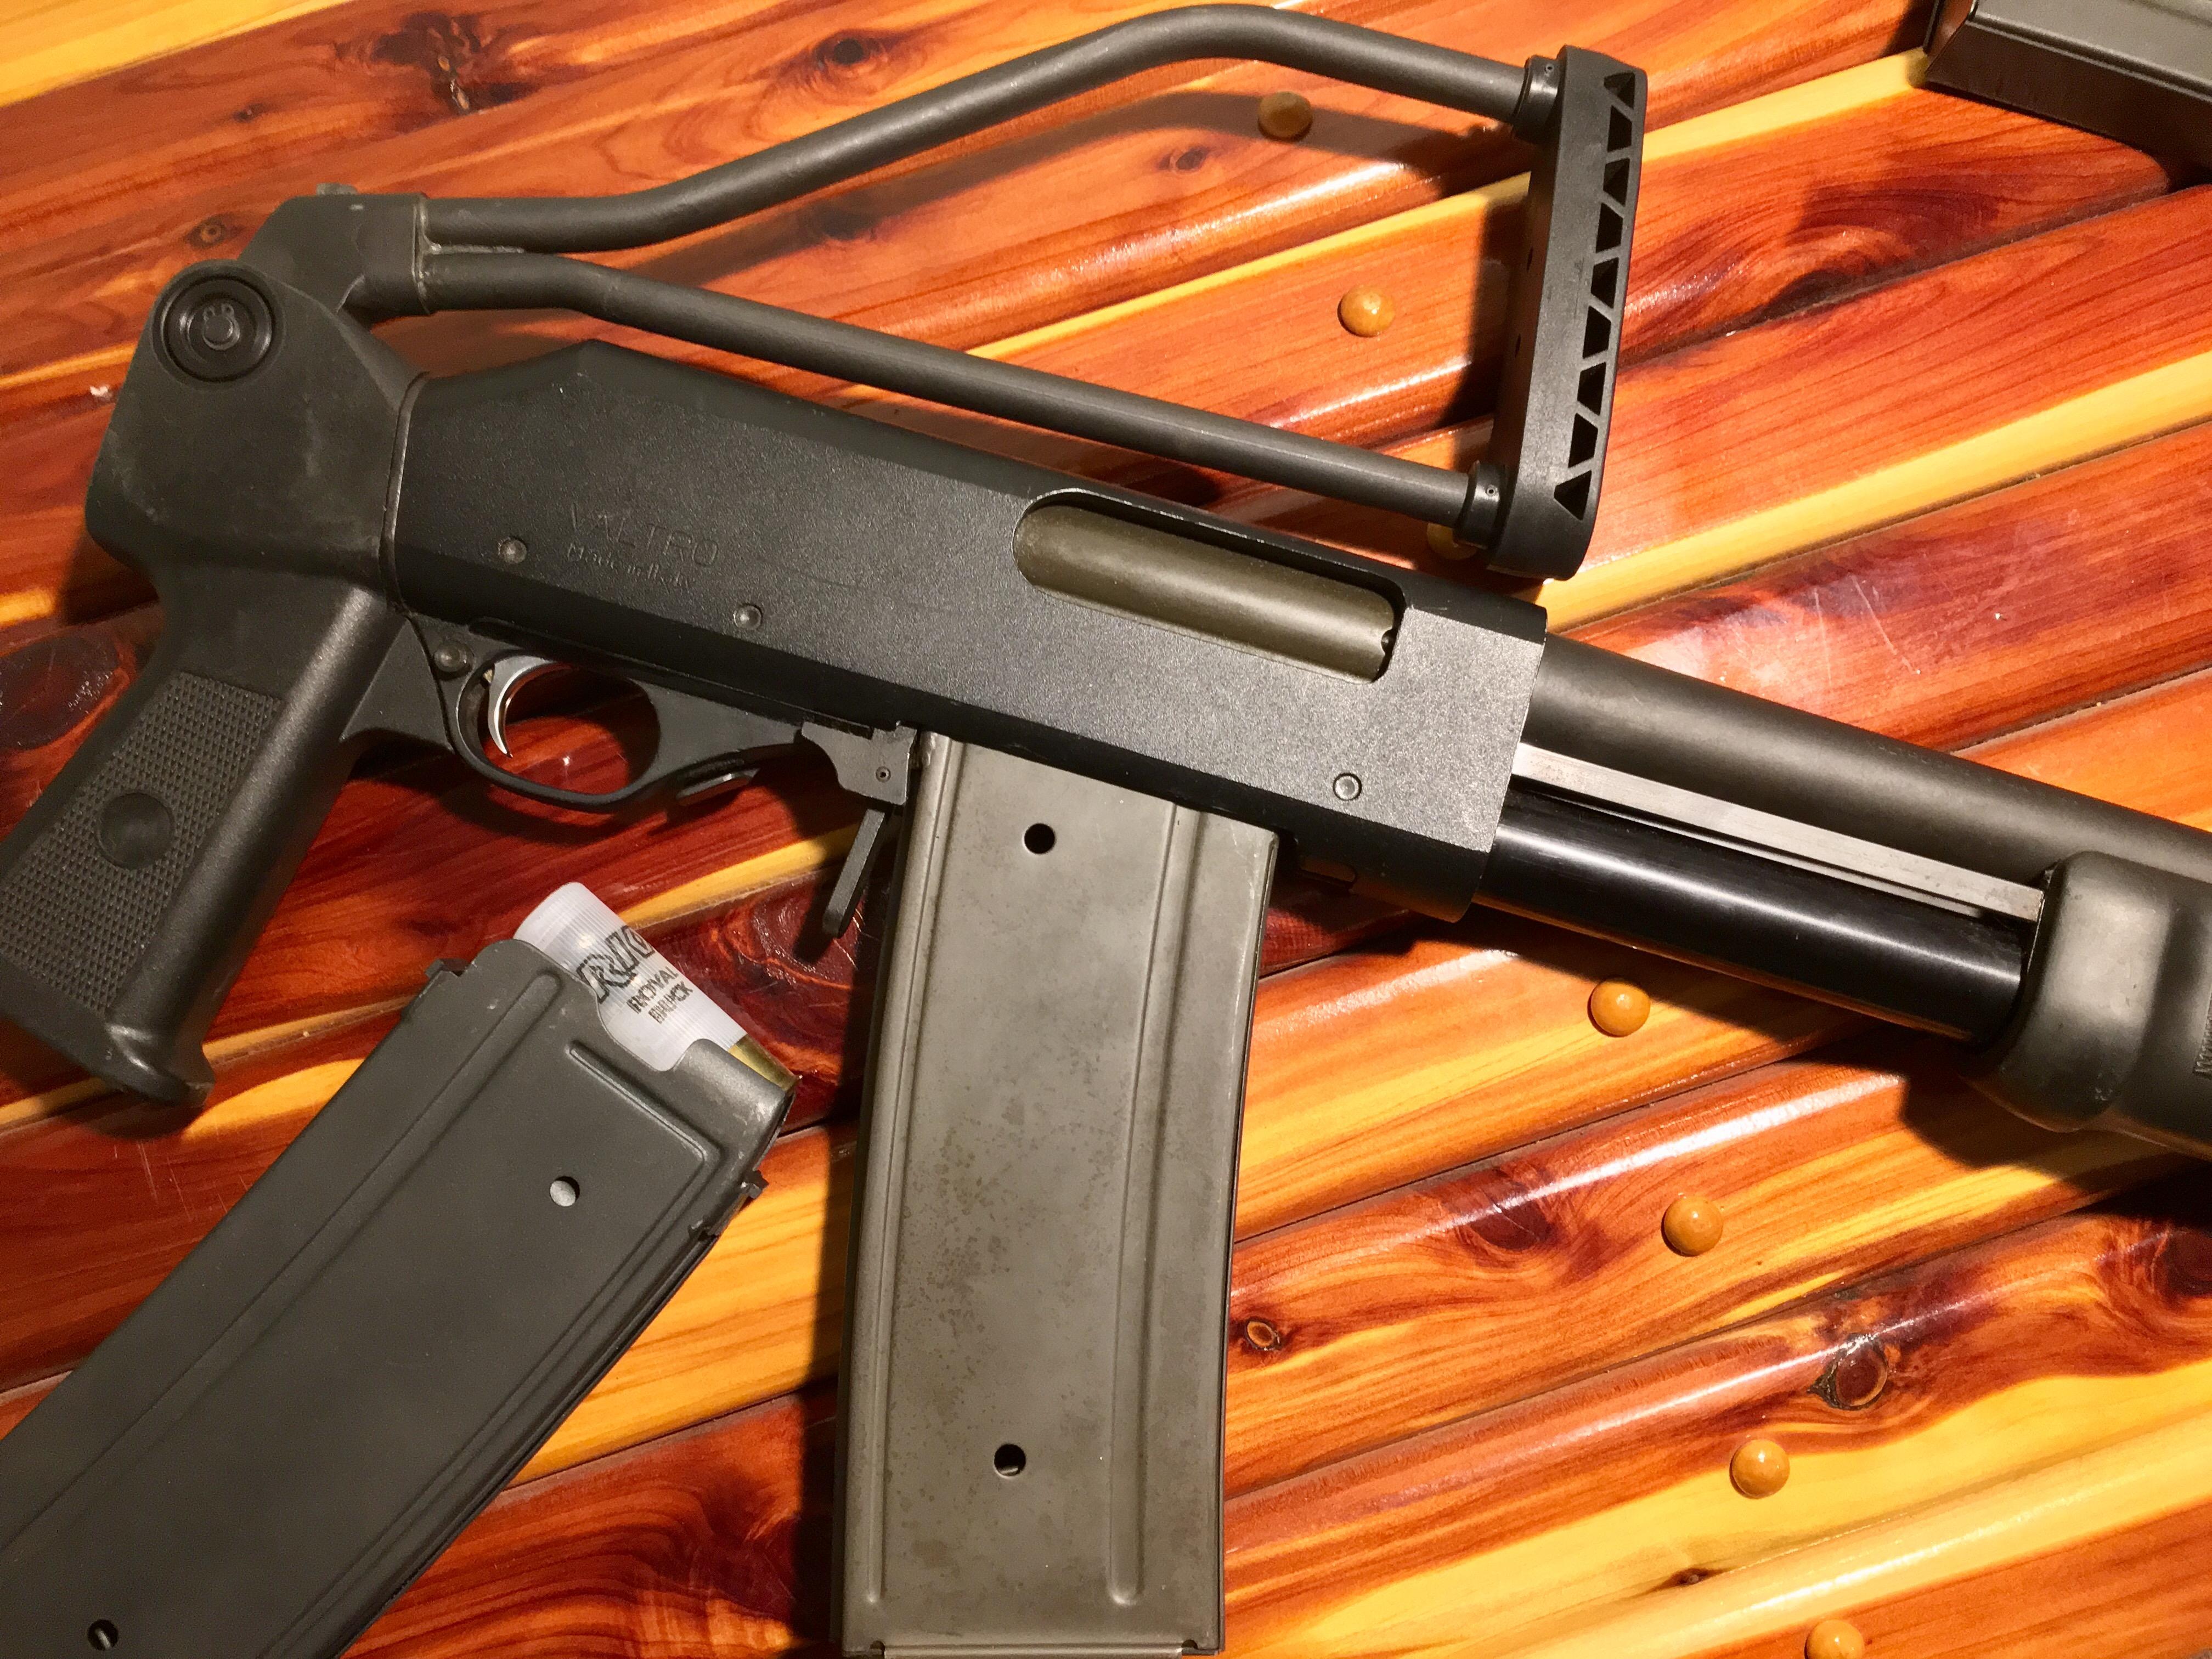 SLR-107R – The Best Bang for Your Buck - The Kommando Blog